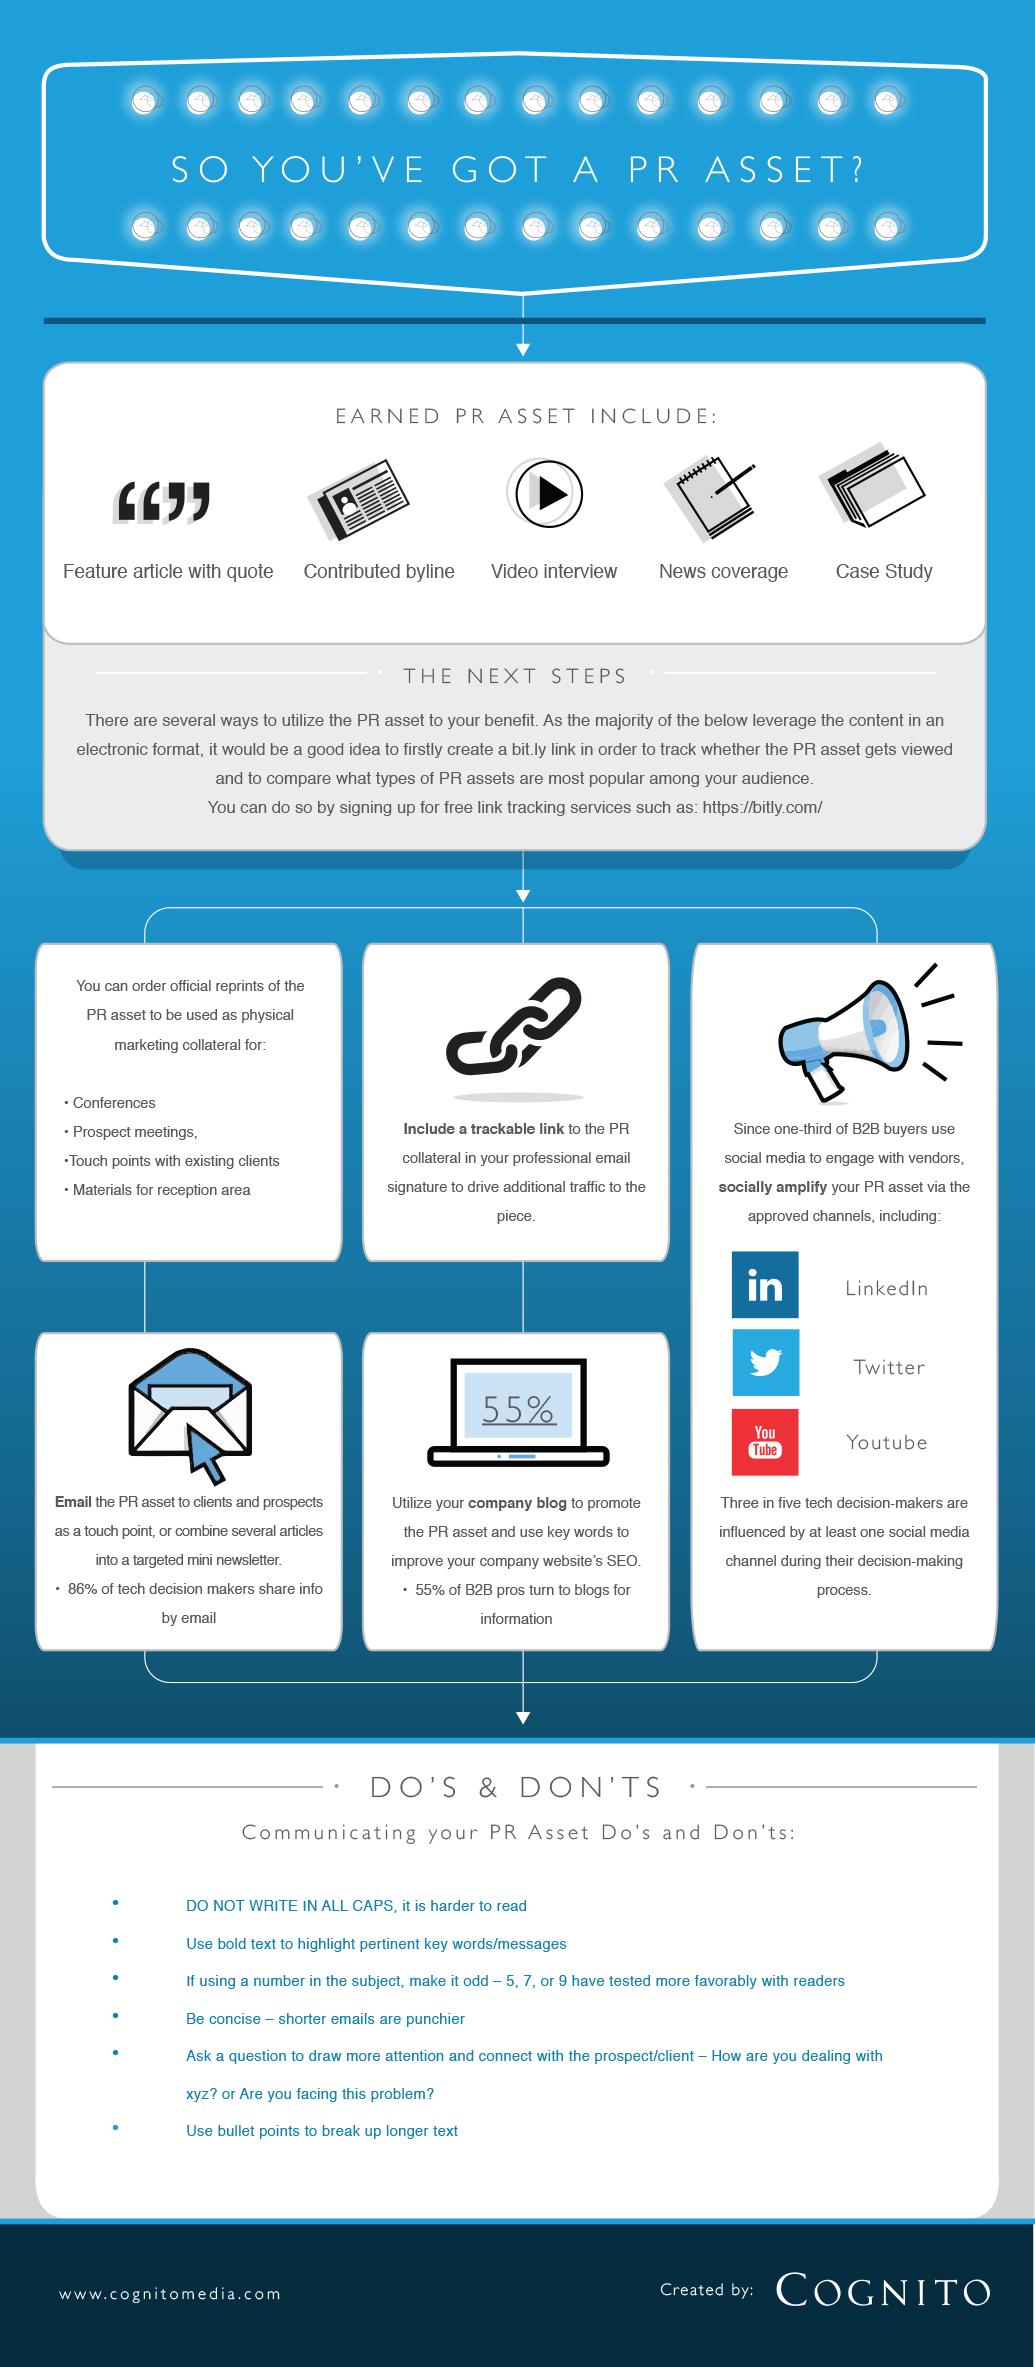 PRasset-infographic